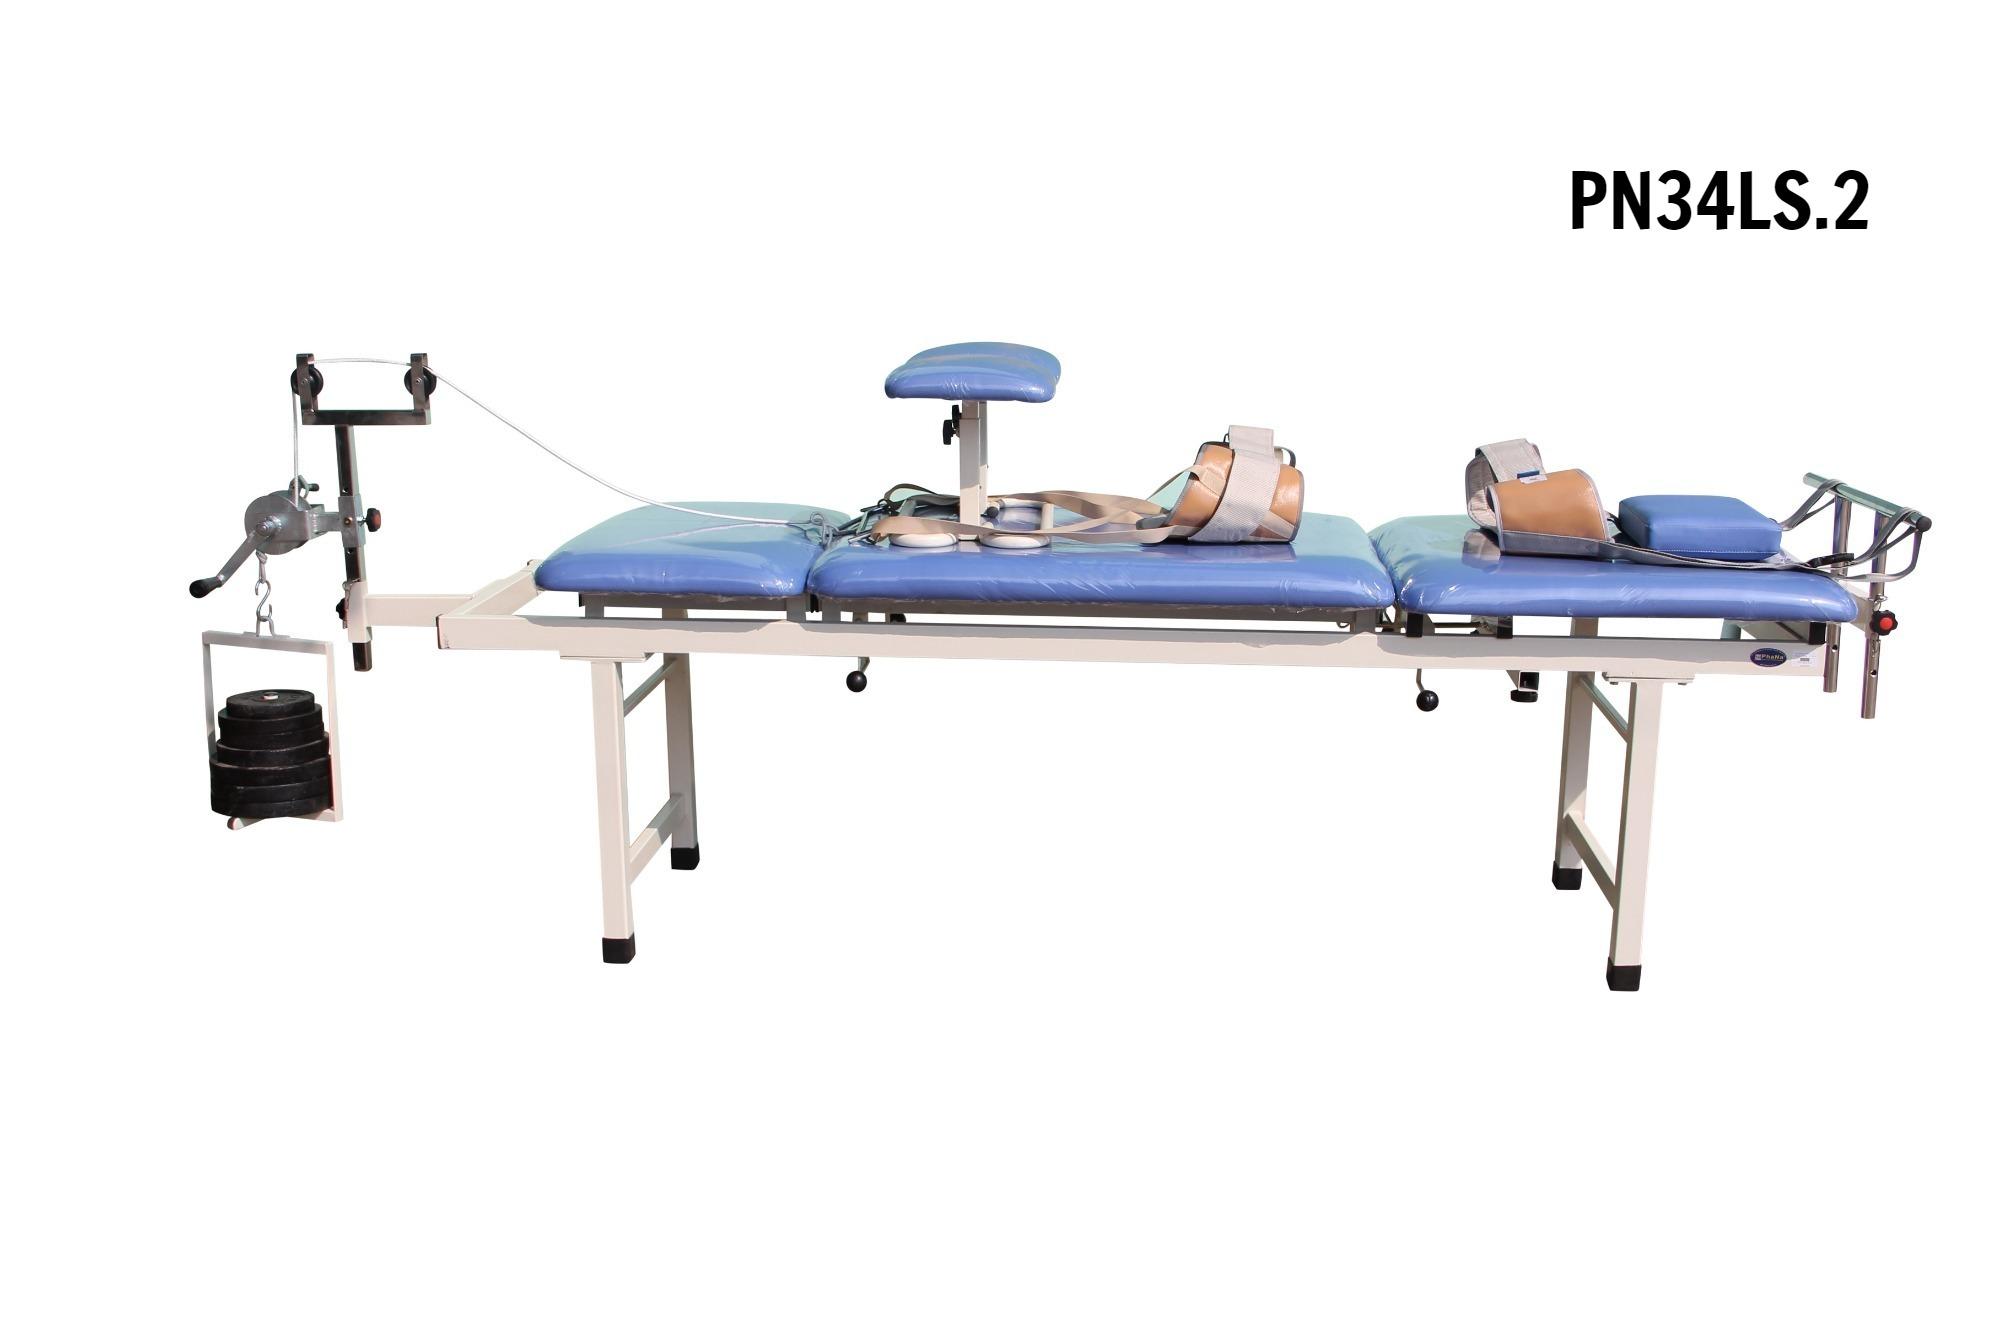 PN34LS.2 - Giường kéo cột sống lưng M2 (Sắt)